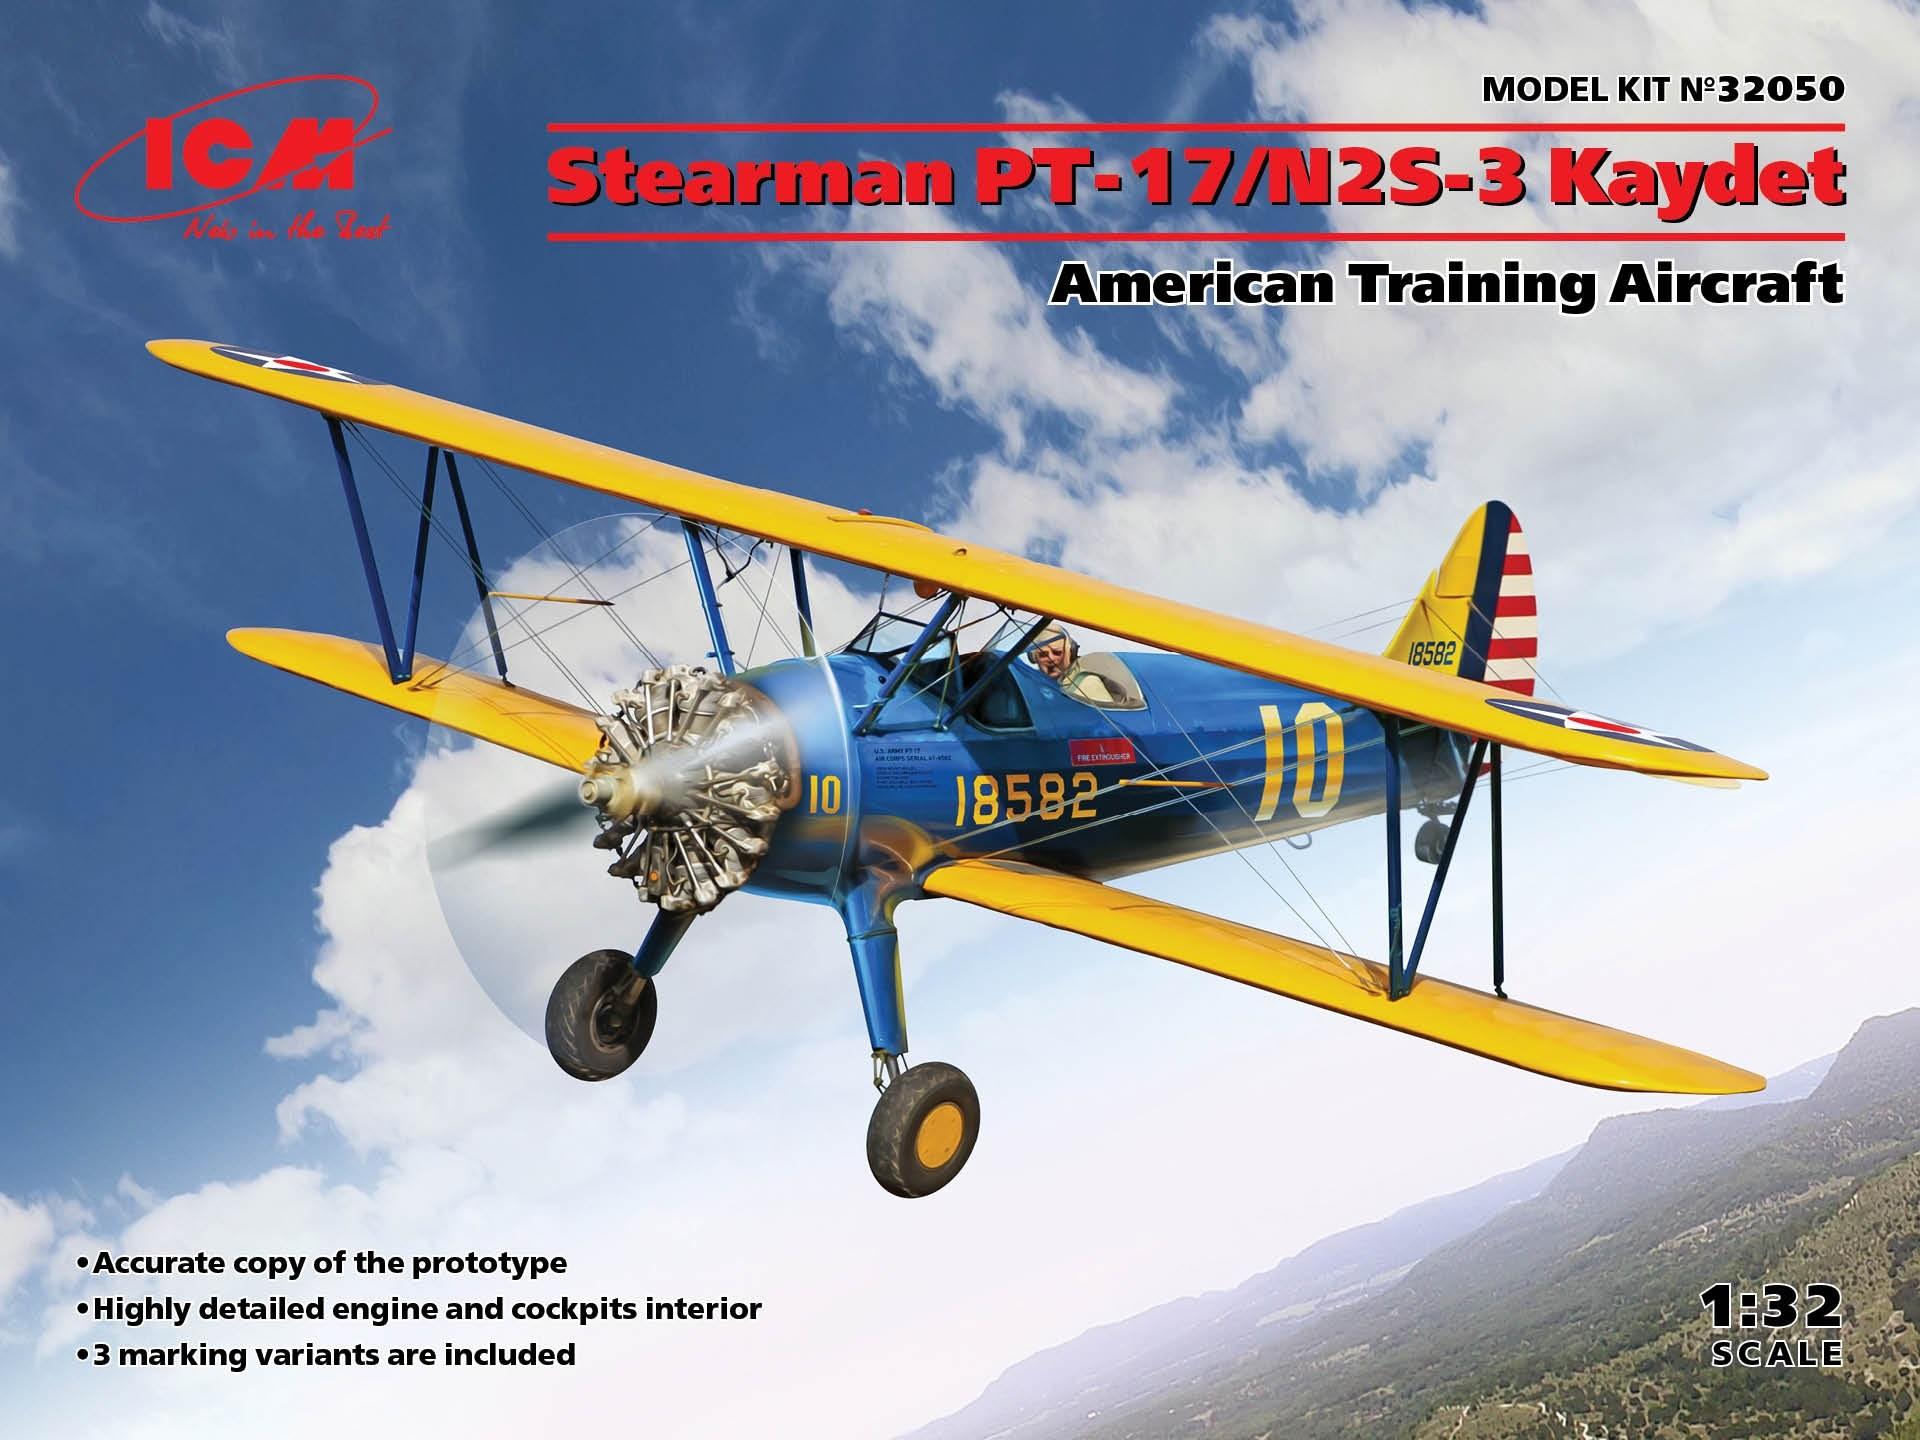 Stearman PT-17/N2S-3 Kaydet